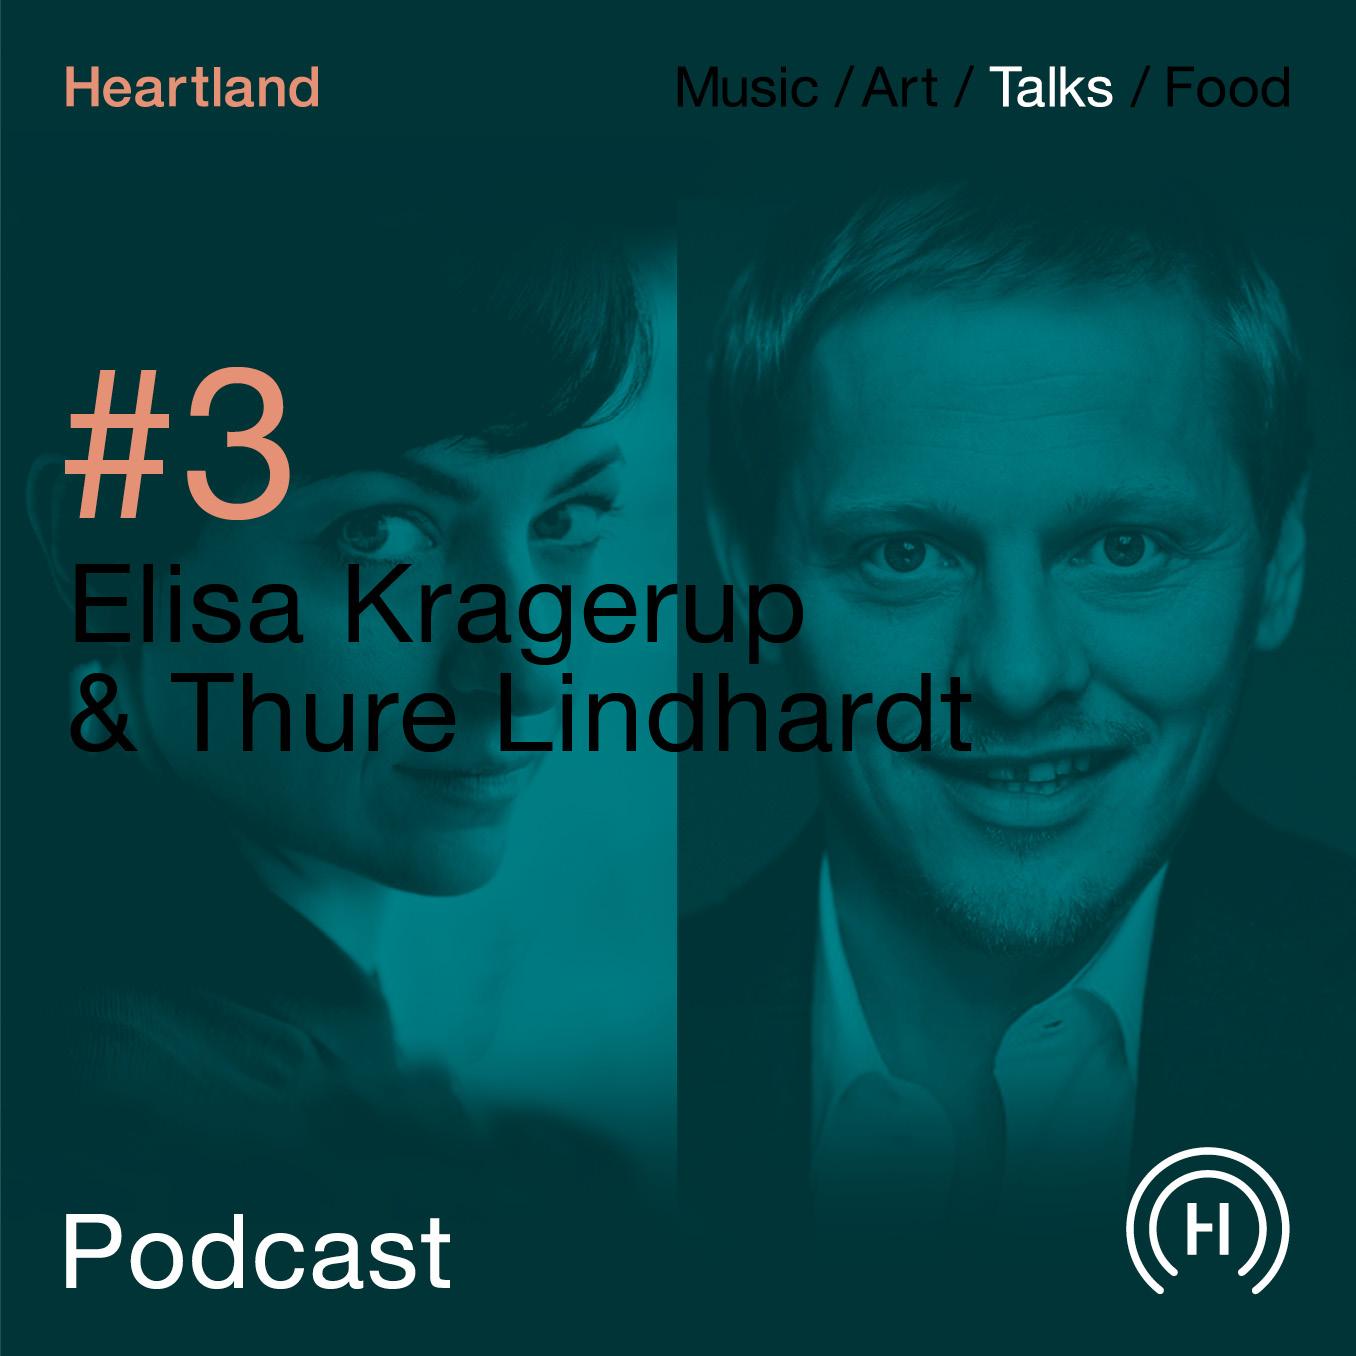 Heartland_New2018_Podcast#3.jpg